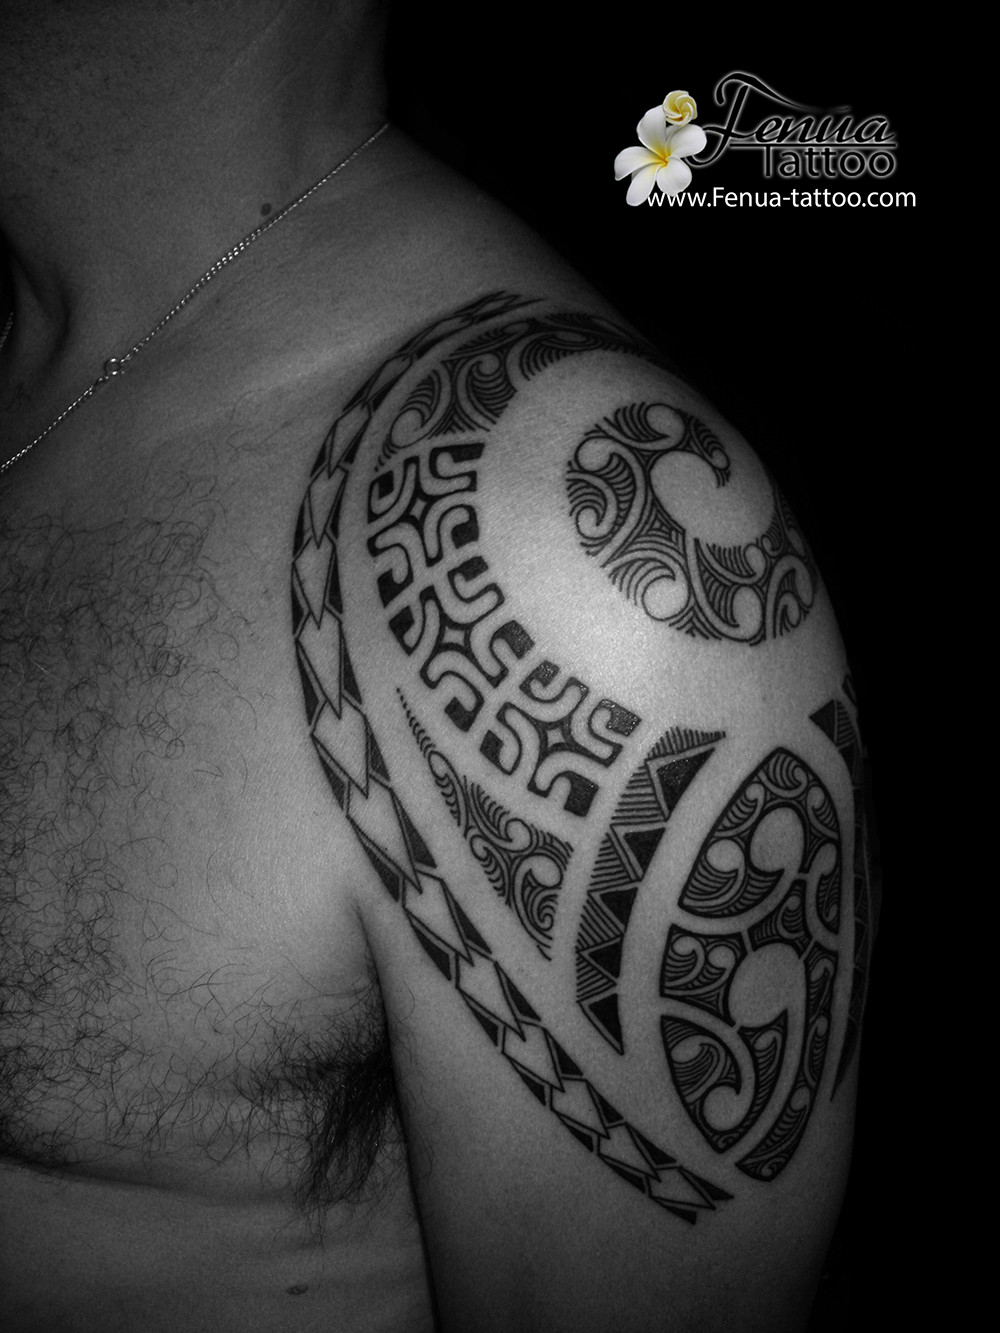 Tattoo polynesien bras epaule par fenua tattoo sanary sur mer toulon et marseille